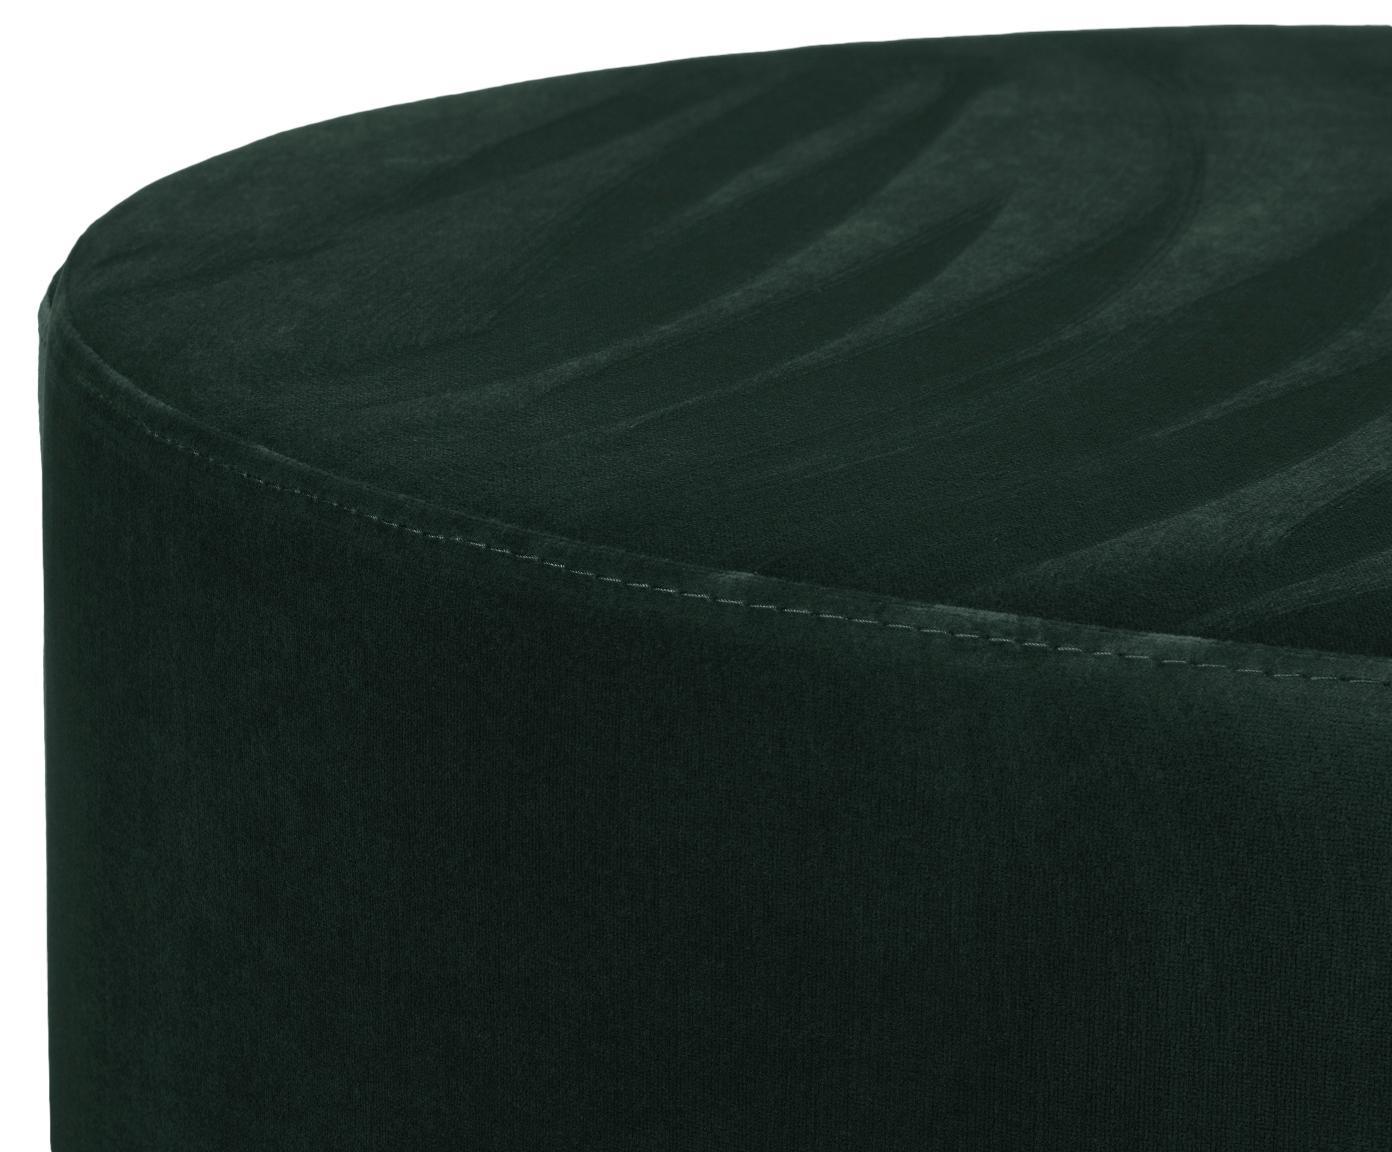 Samt-Hocker Daisy, Bezug: Samt (Polyester) 15.000 S, Rahmen: Mitteldichte Holzfaserpla, Samt Dunkelgrün, Ø 54 x H 40 cm